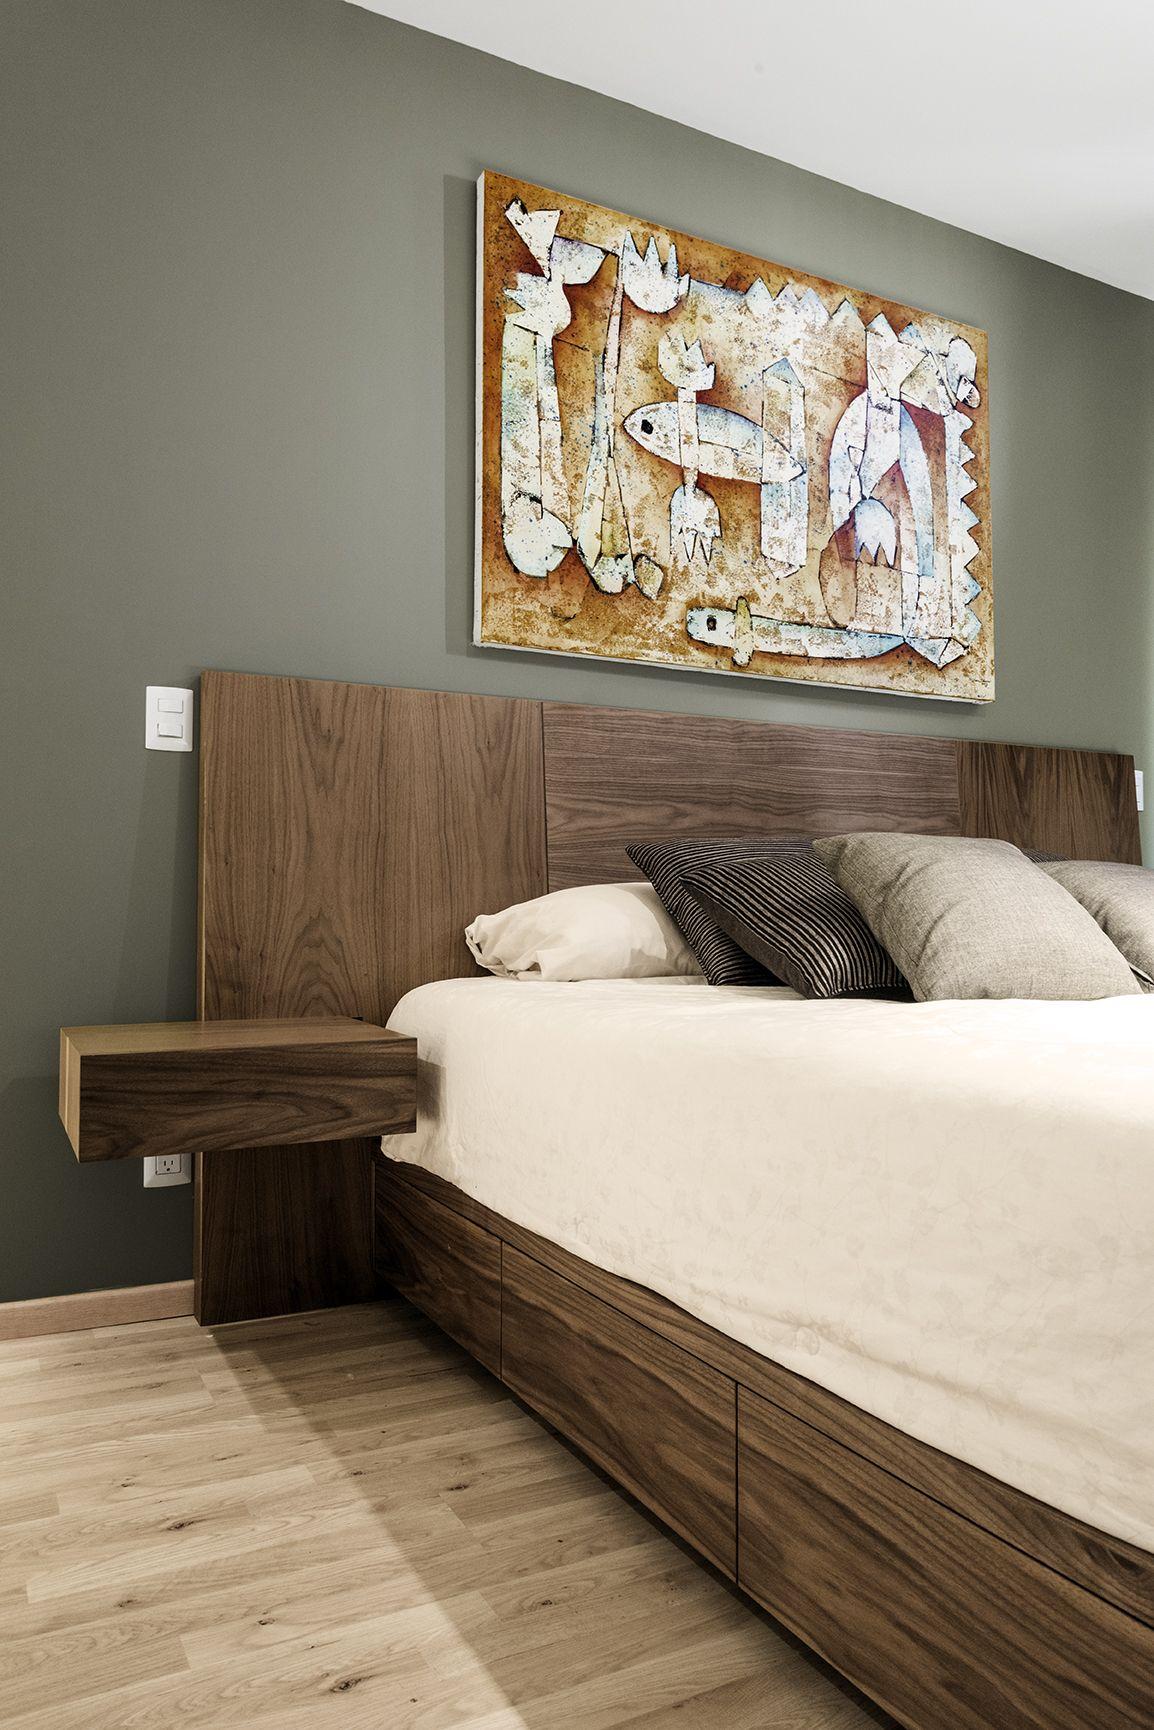 Rec mara king con cajones en base de cama cuadro de juan for Cama diseno